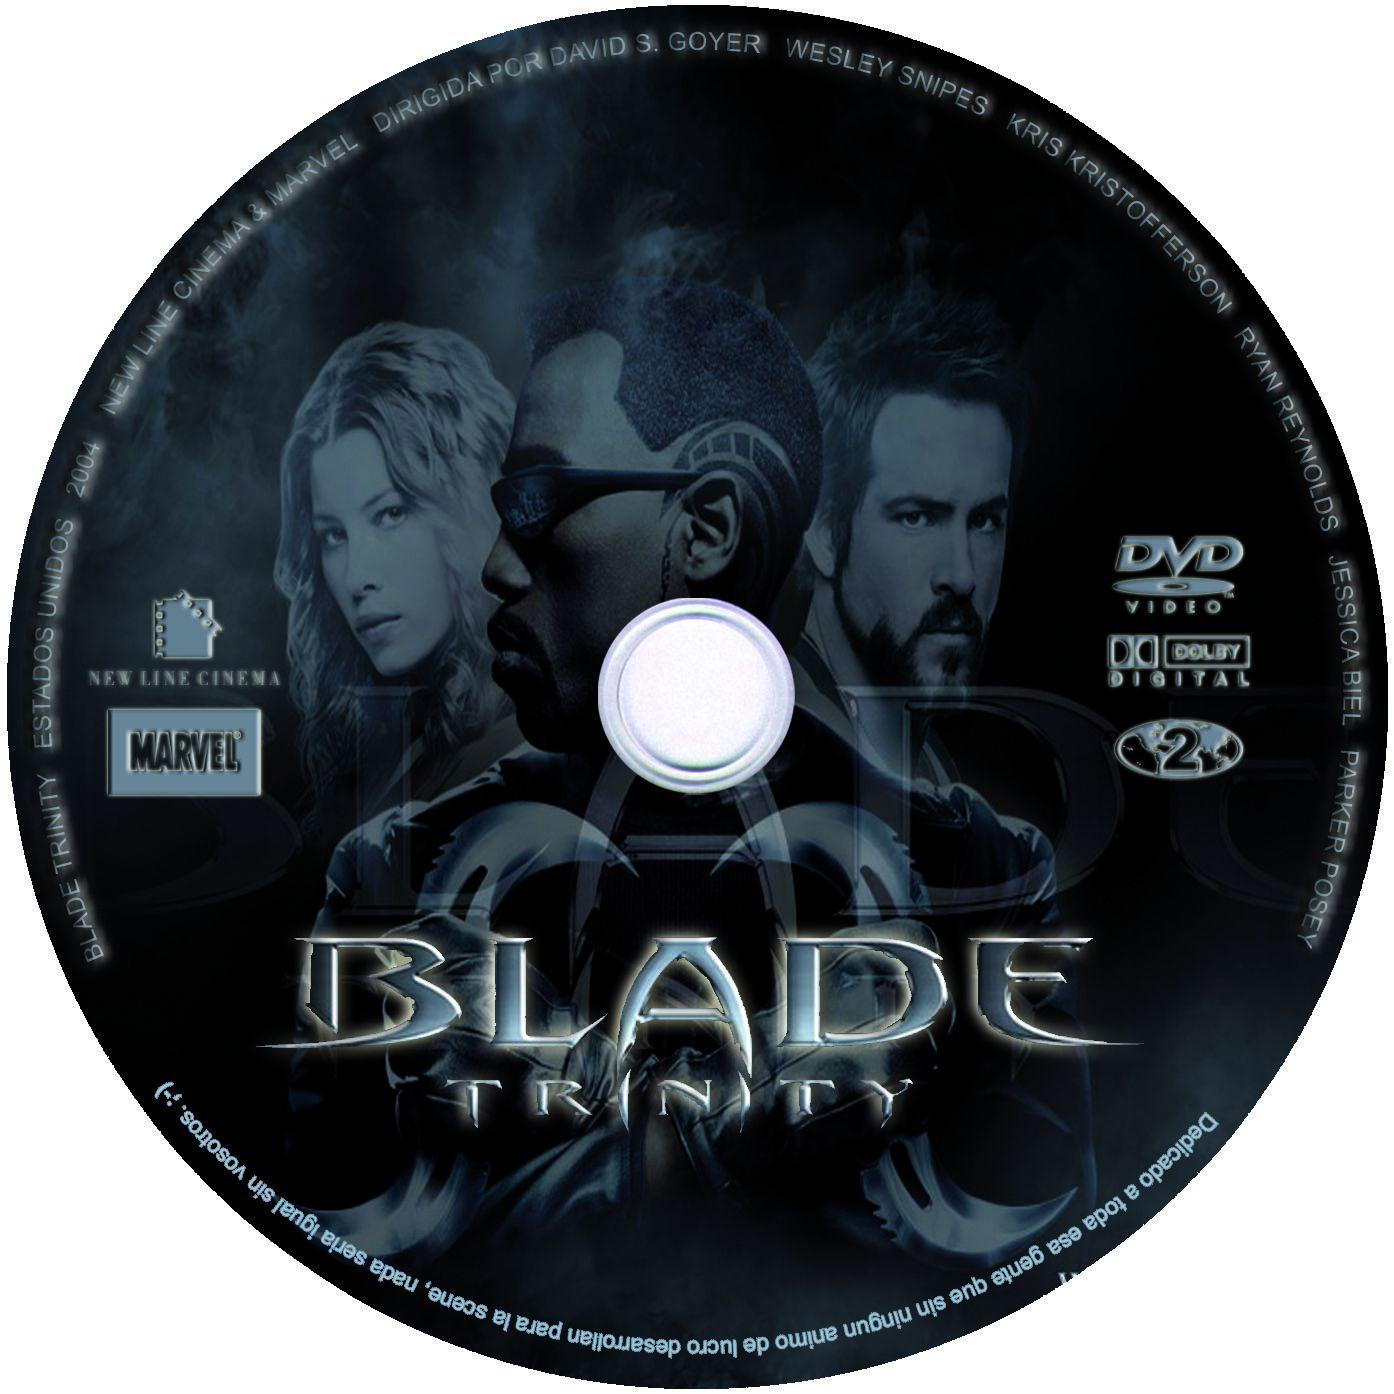 http://3.bp.blogspot.com/_FN7dlH54yBQ/TMz7oH8EJtI/AAAAAAAAEPE/cxCP16t3bXg/s1600/Blade+Trinity+CD.jpg